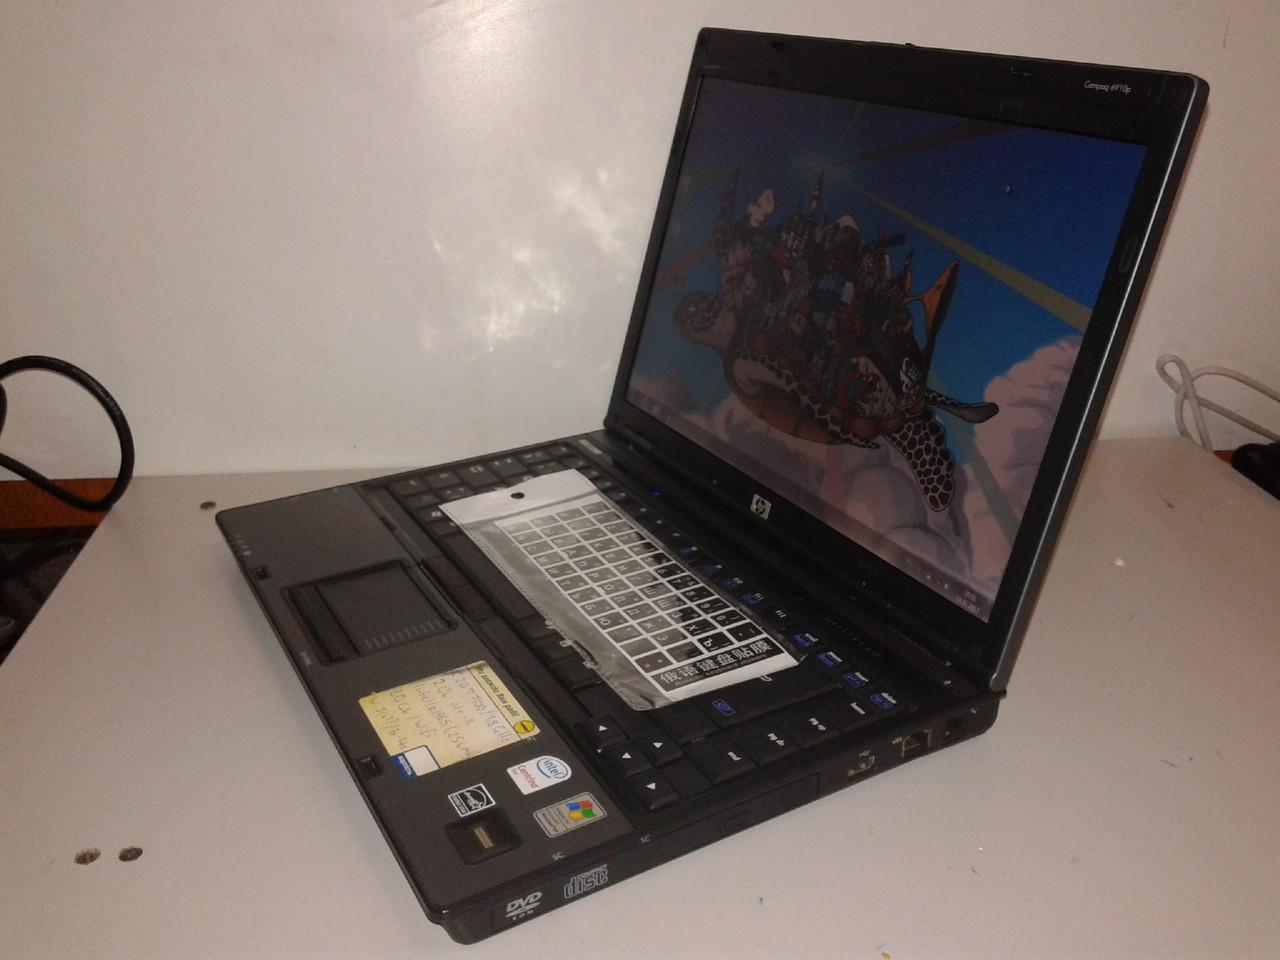 HP 6910p 2ядра 2Gb корпус магний(металл)